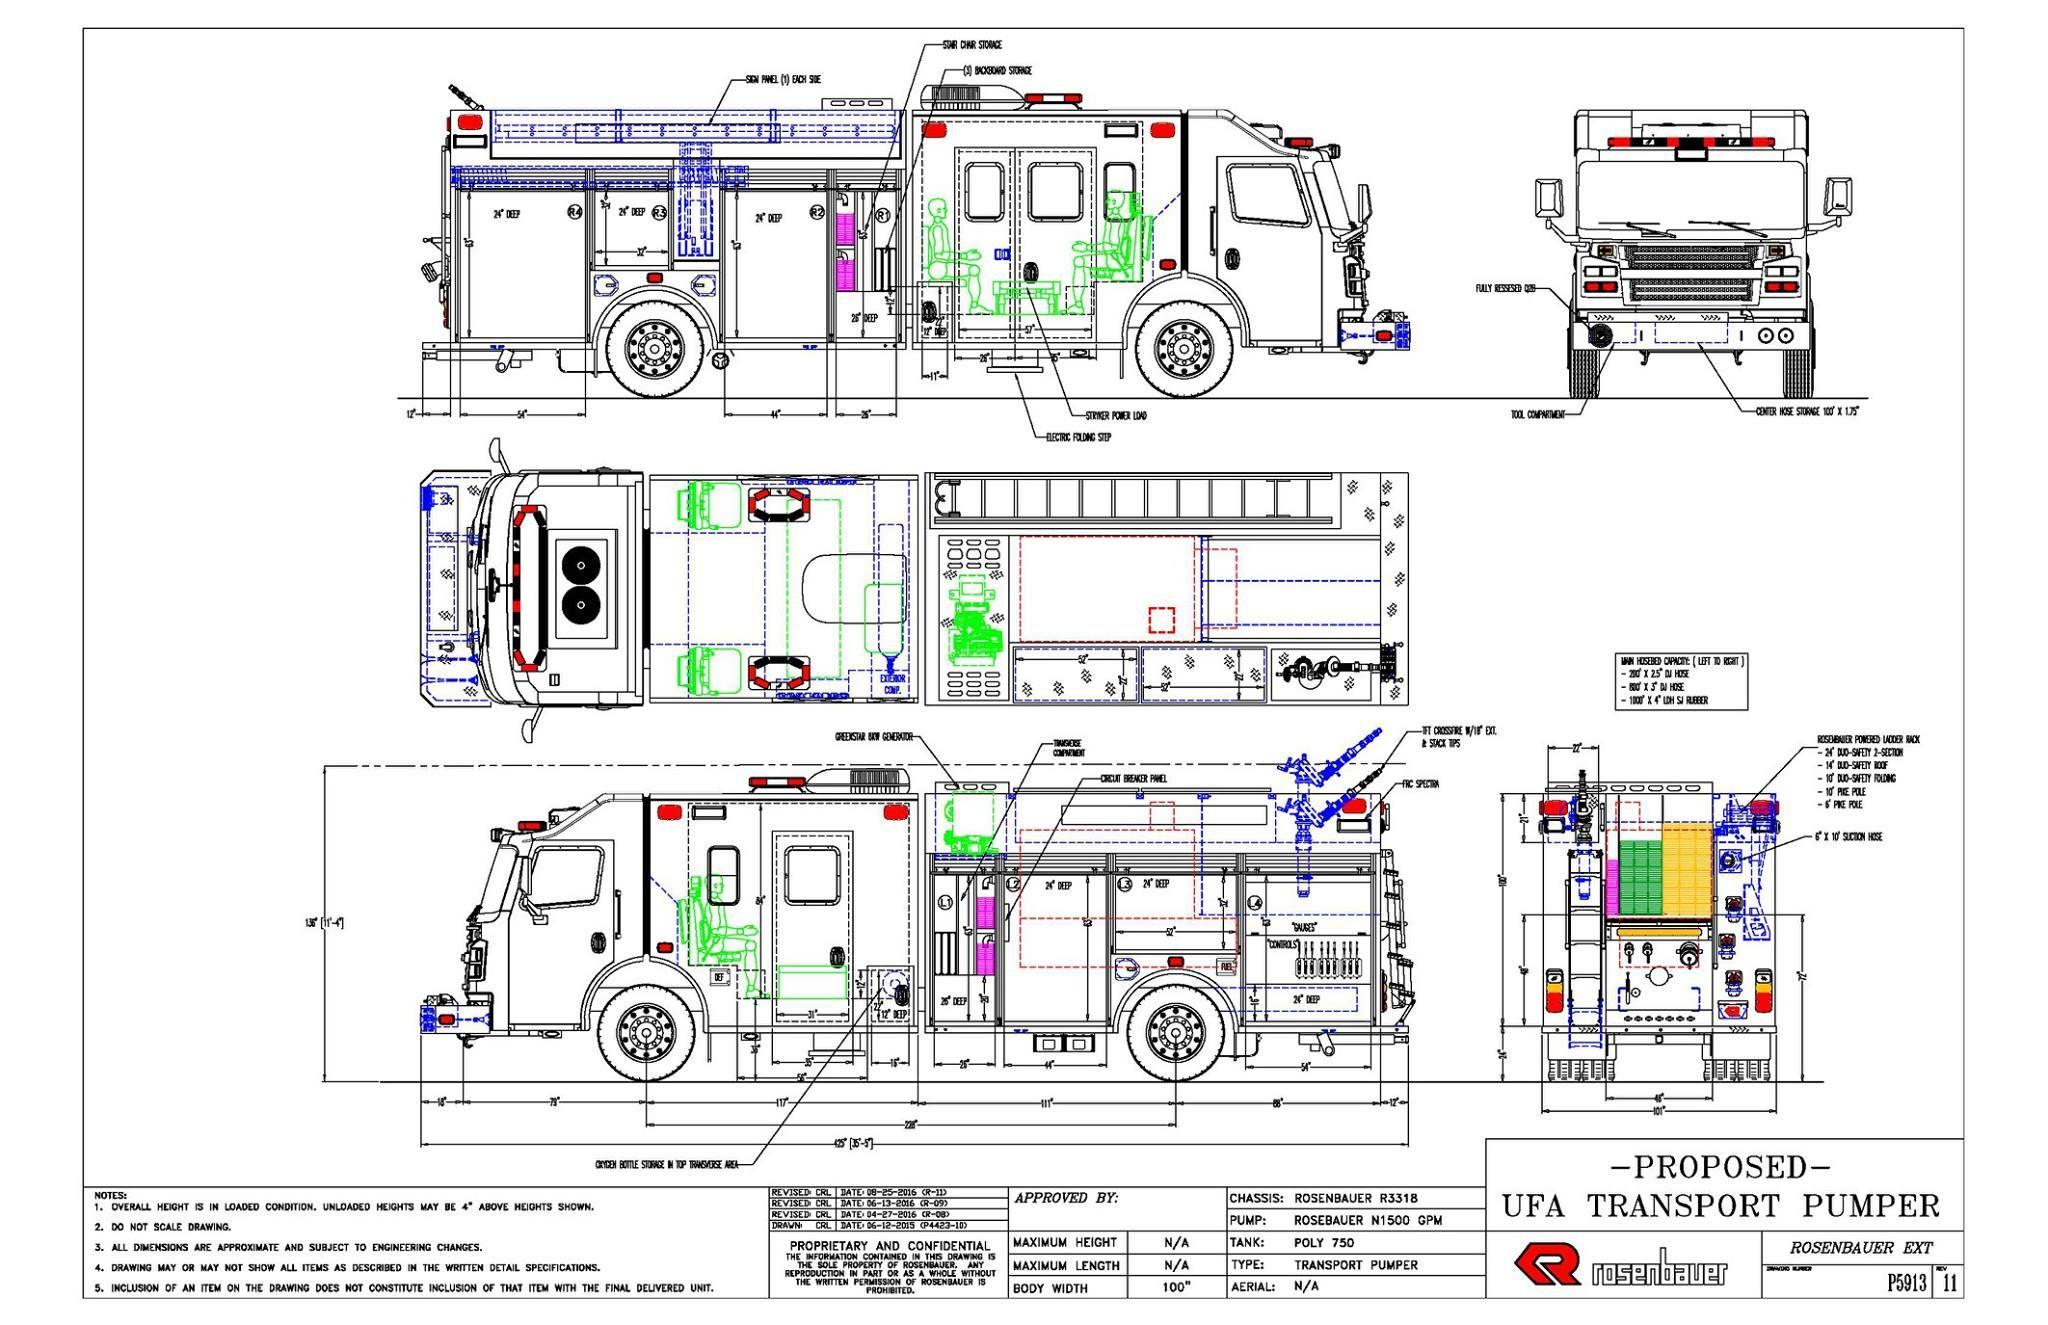 medium resolution of unified fire authority rosenbauer fire engine drawing fire engine fire trucks firefighter fire